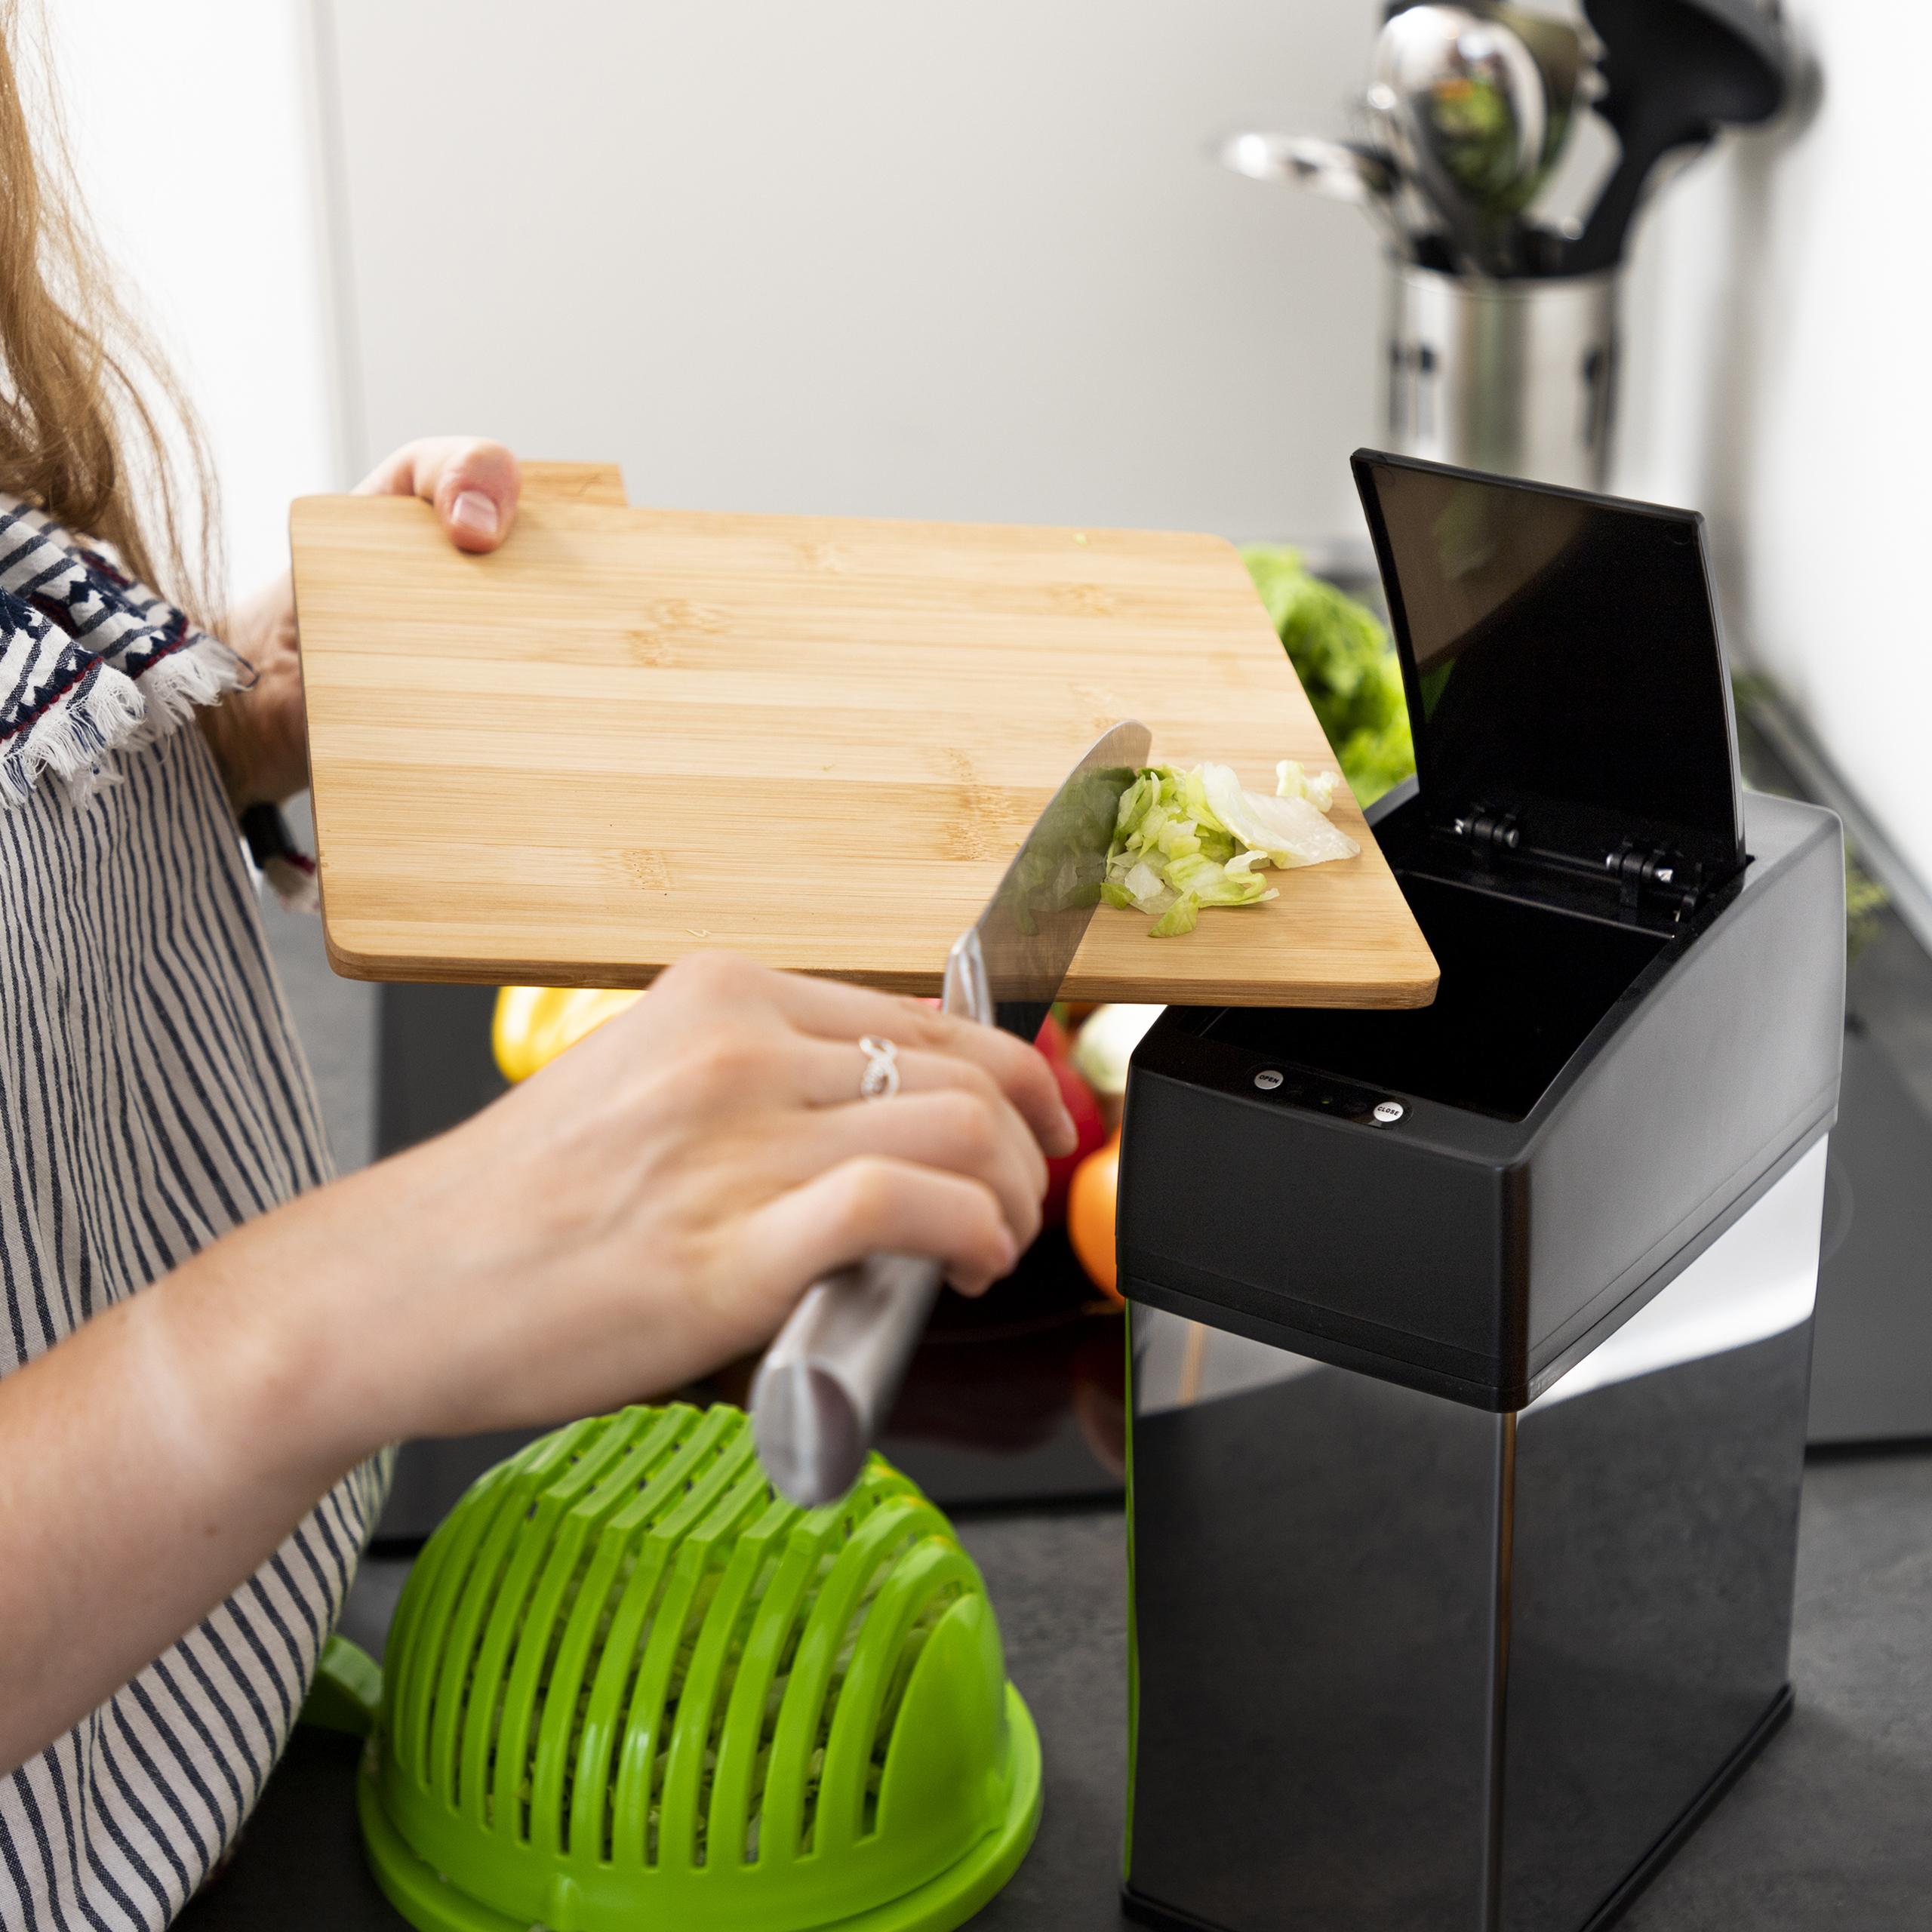 Sensor Mülleimer Edelstahl Metalleimer Abfalleimer Kosmetikeimer Abfallbehälter